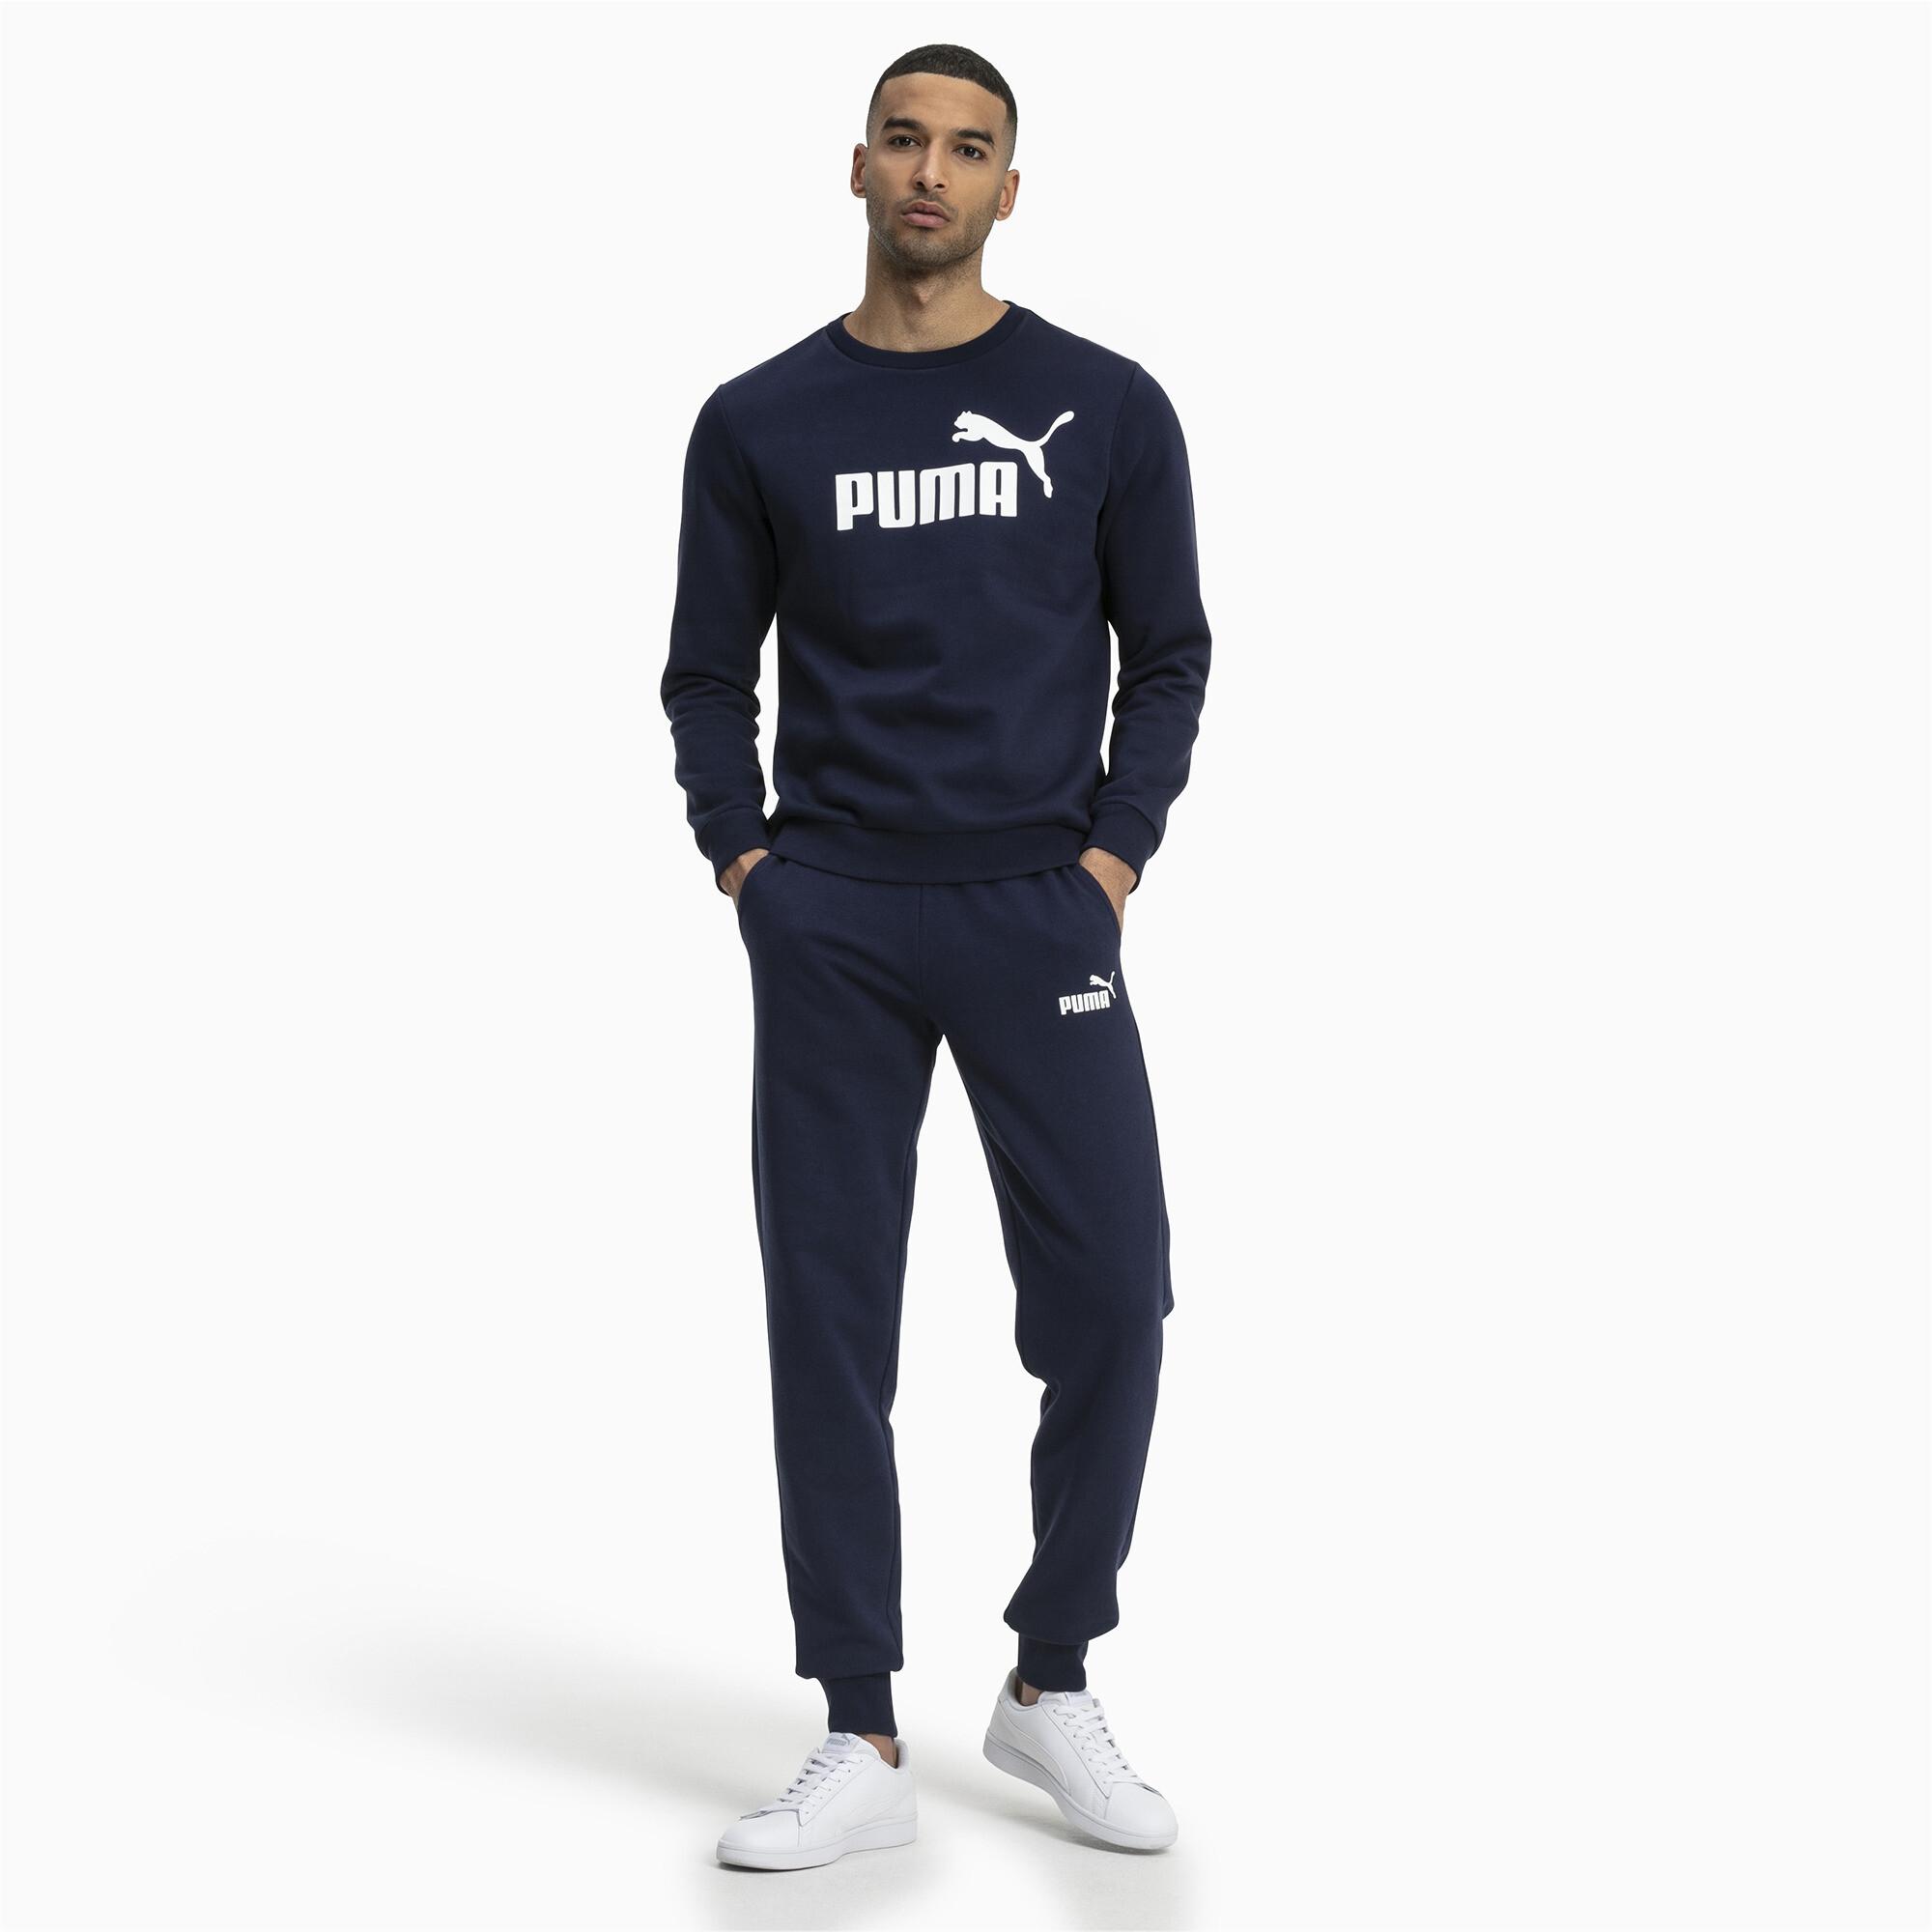 PUMA Essentials Herren Fleece Sweatshirt Männer Sweat Basics